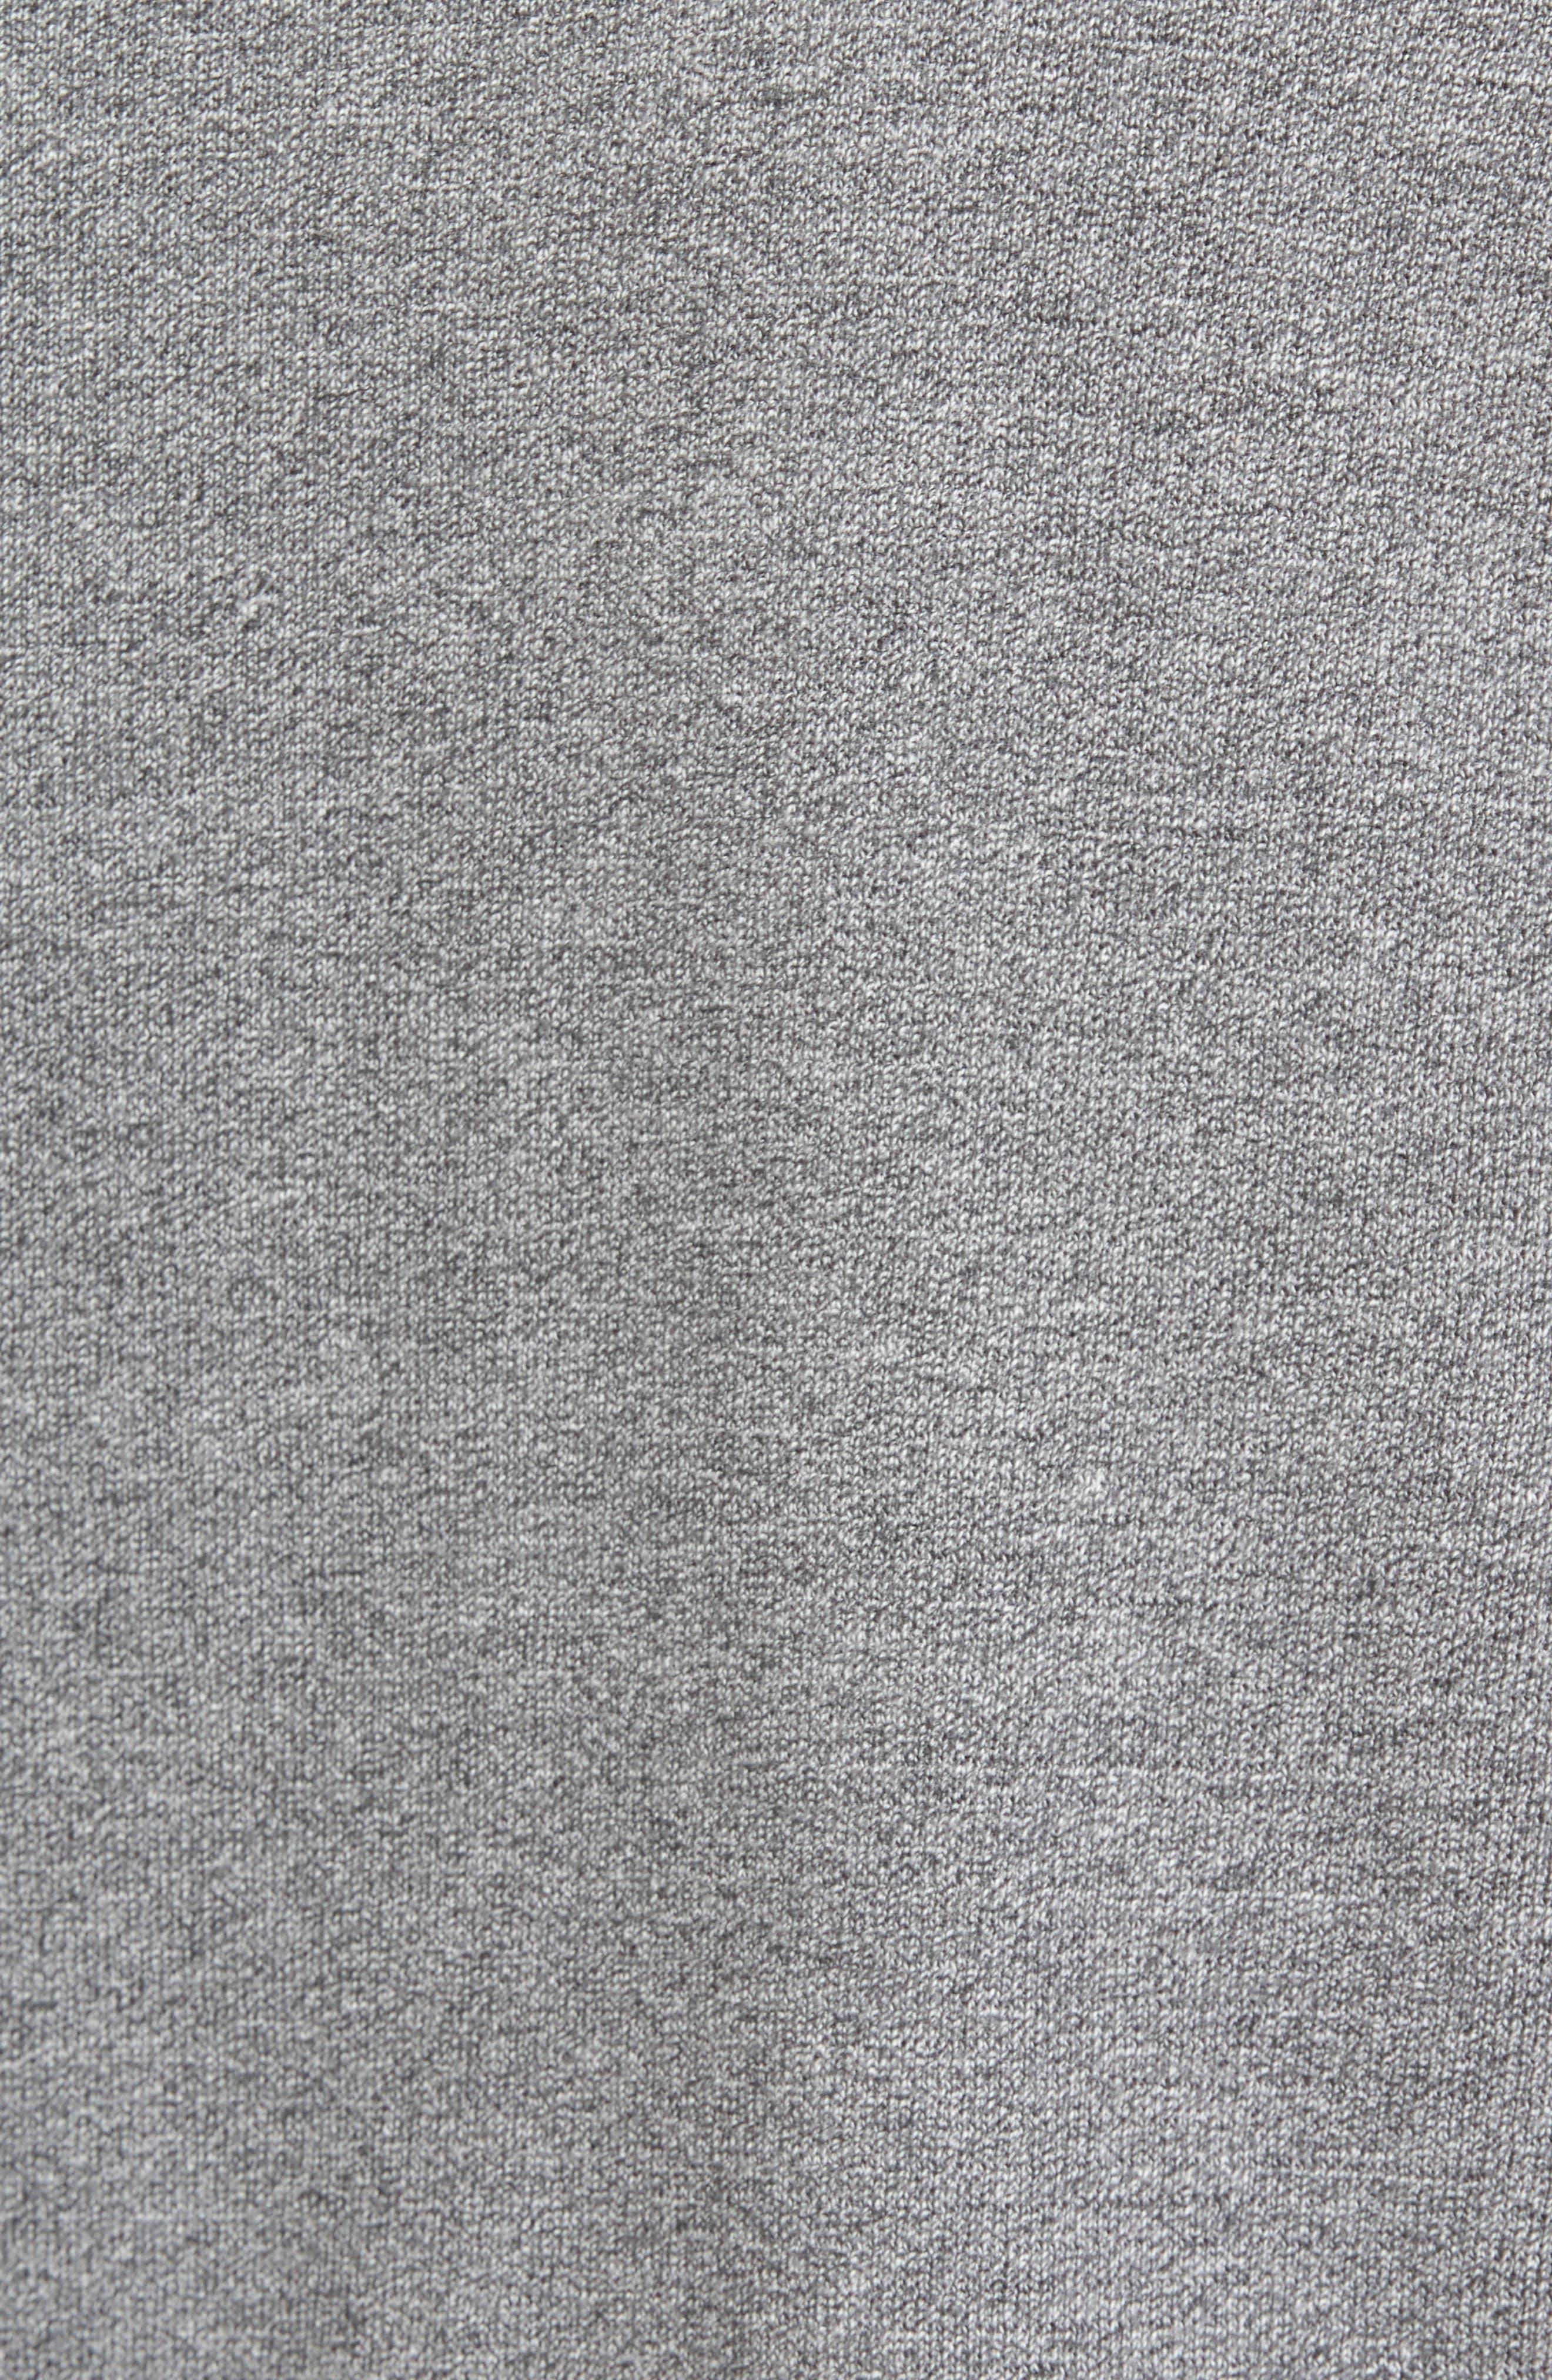 NFL Stitch of Liberty Embroidered Crewneck Sweatshirt,                             Alternate thumbnail 151, color,